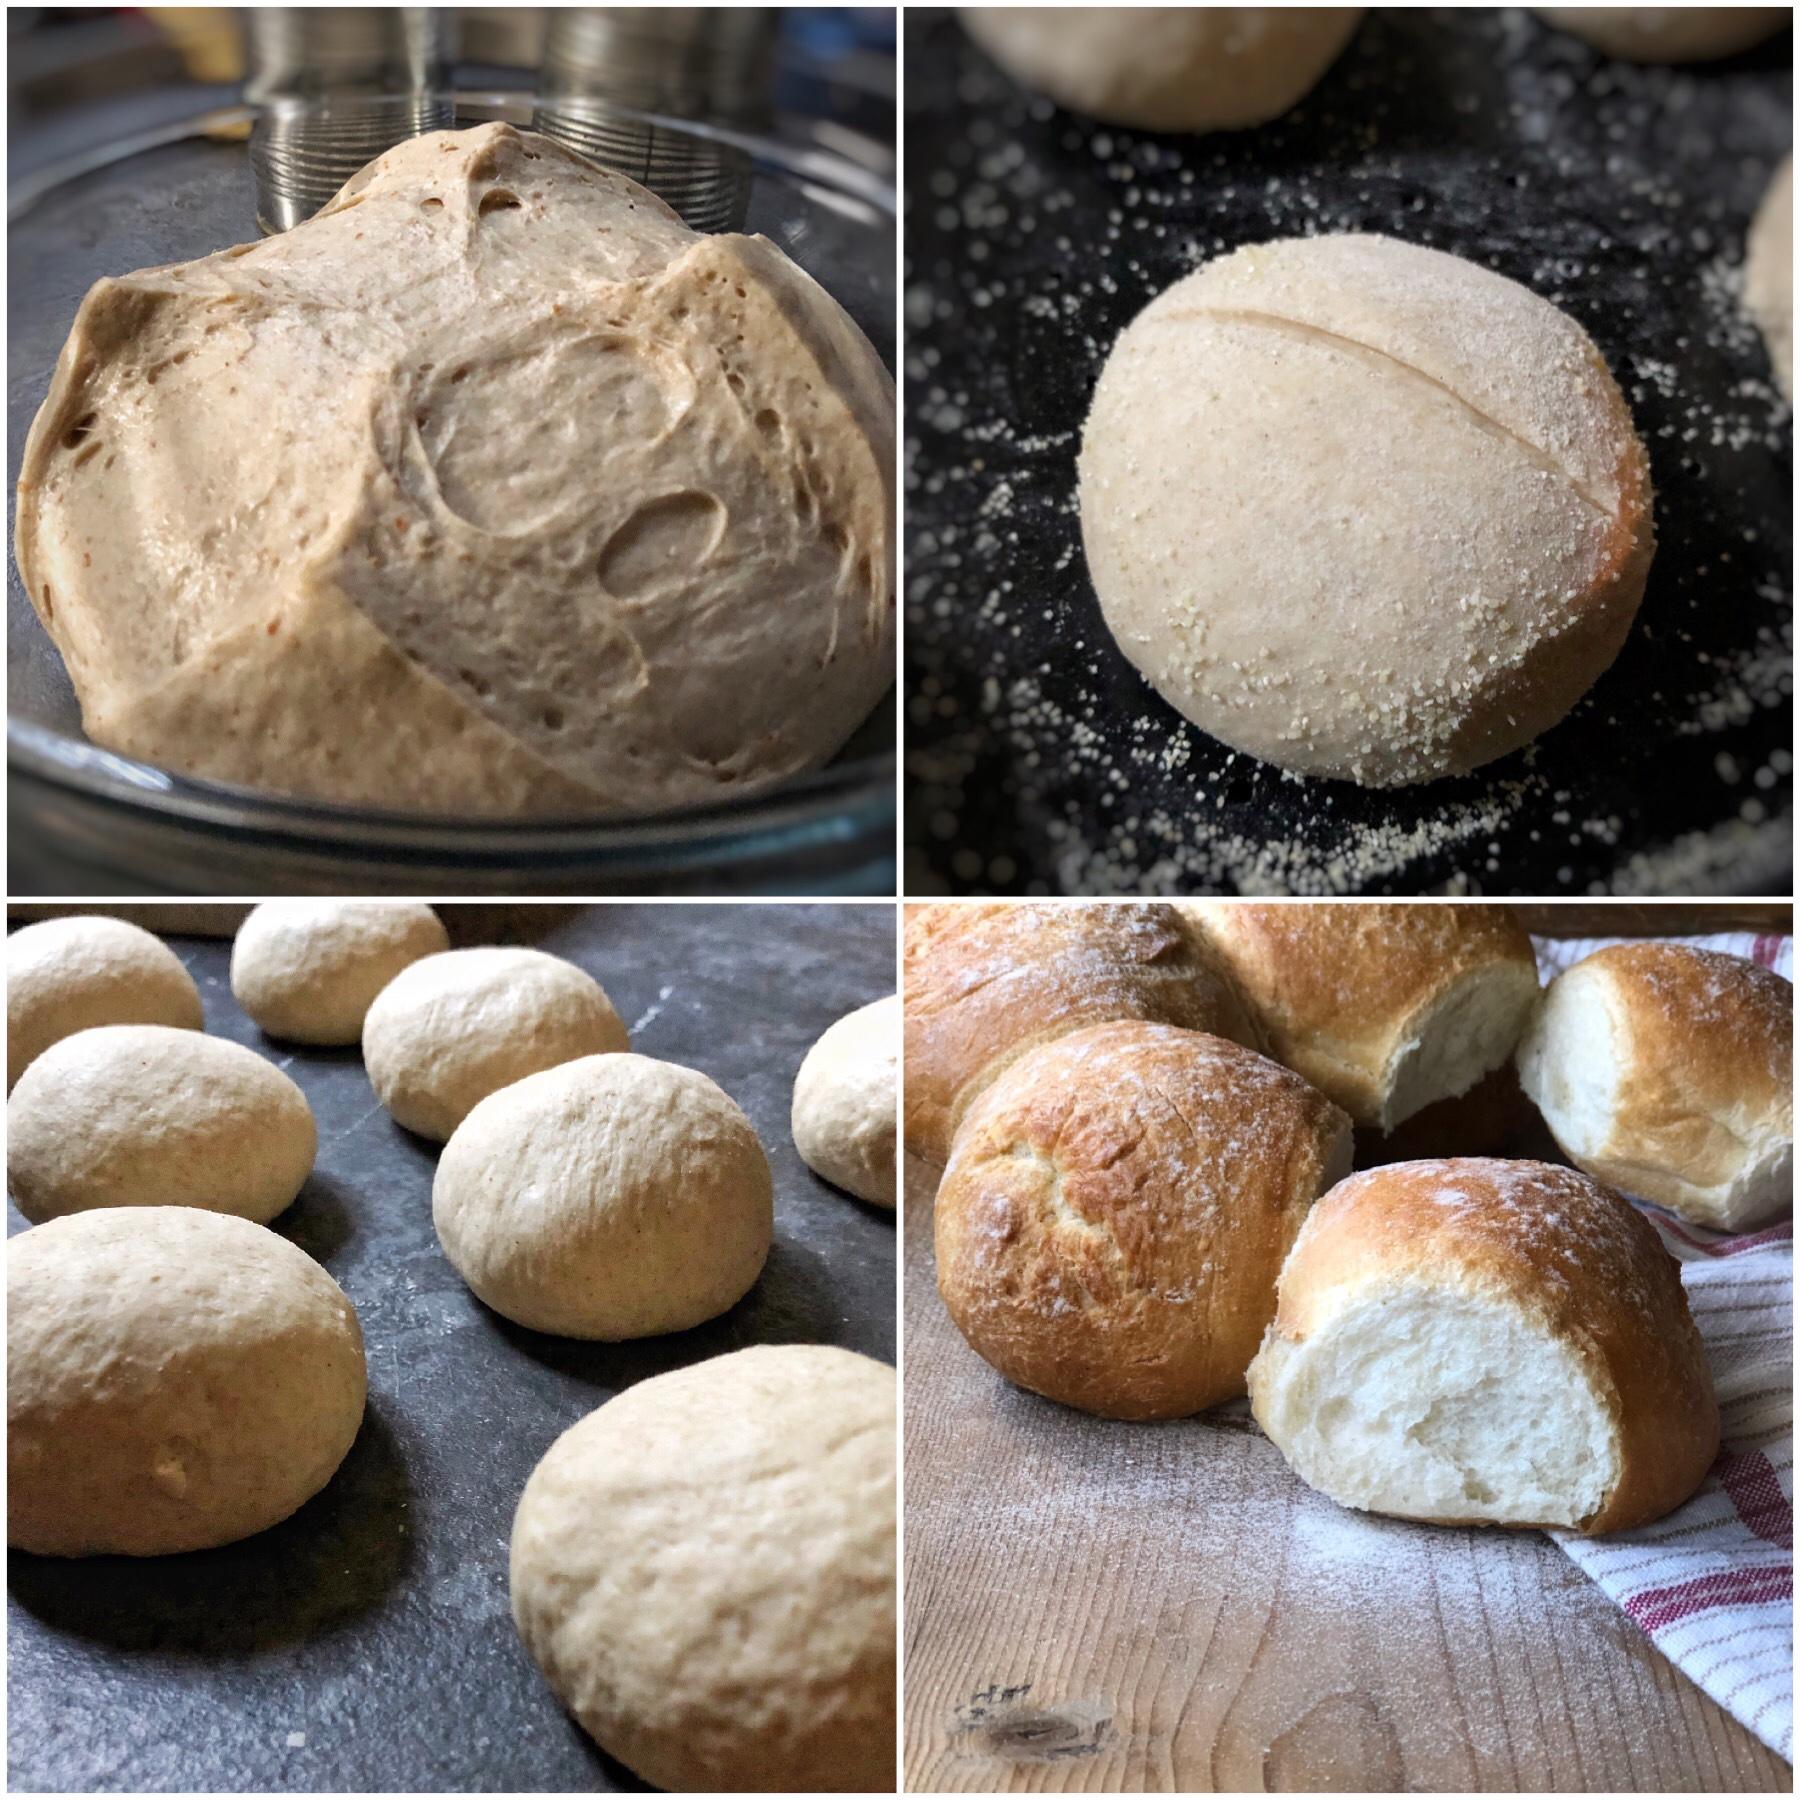 Corona di pane rustico